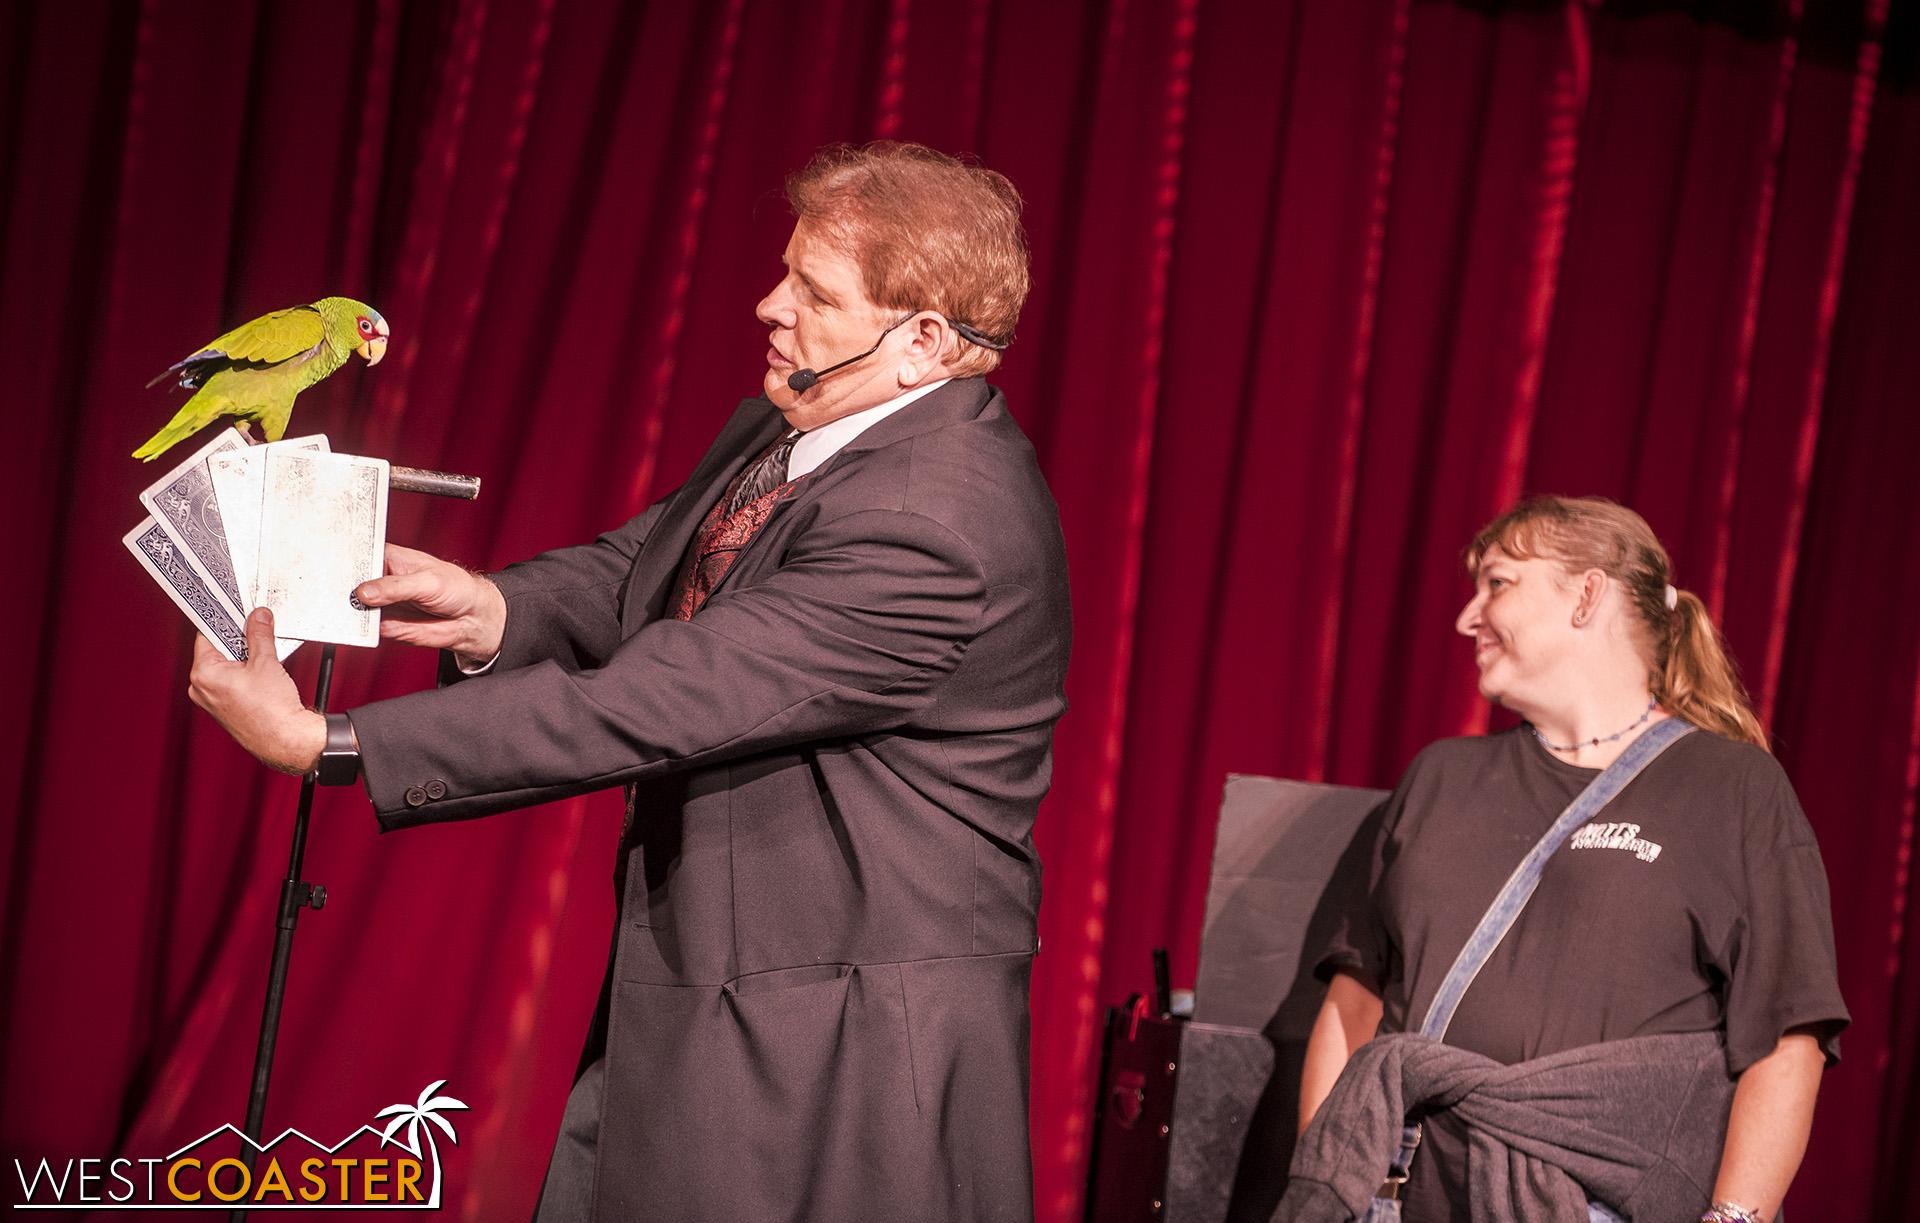 Magician Dana Daniels, helping his bird perform a card trick.